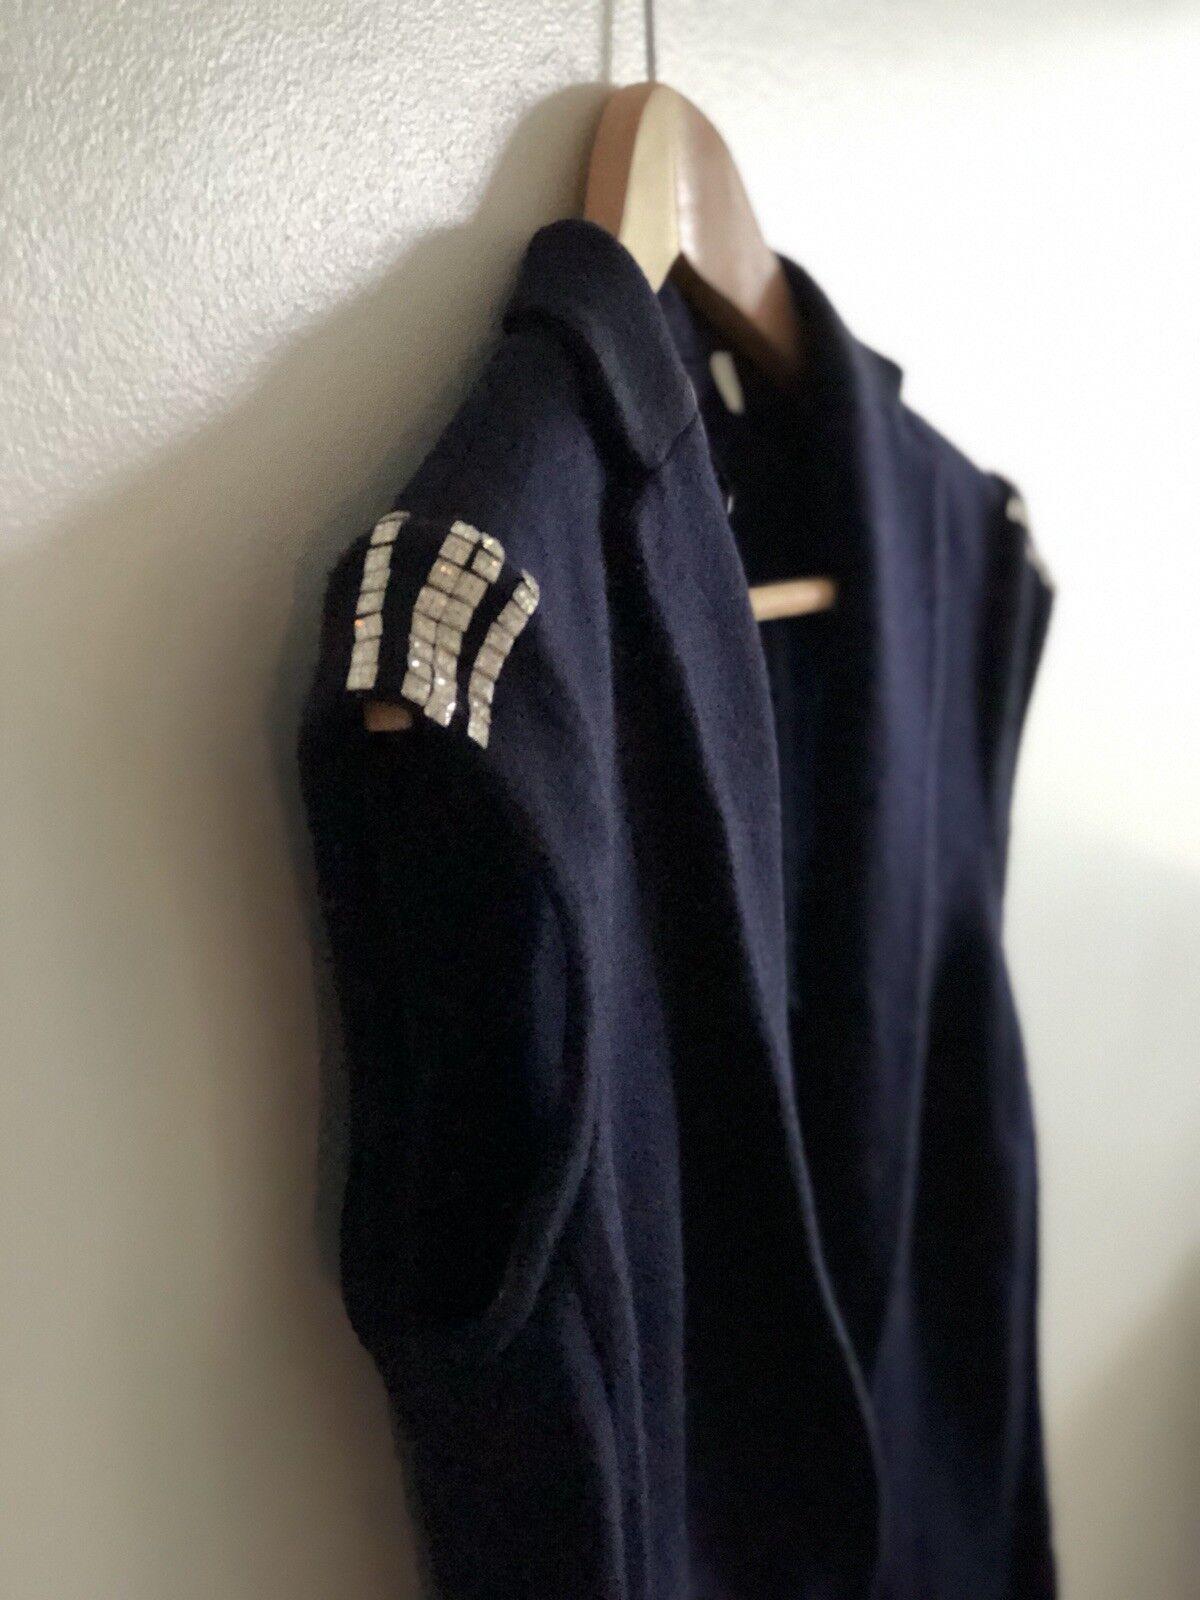 IISLI  478 Navy Navy Navy bluee Knit Waist Coat 100% Soft Wool Swarovski Crystal Grommets 740f83